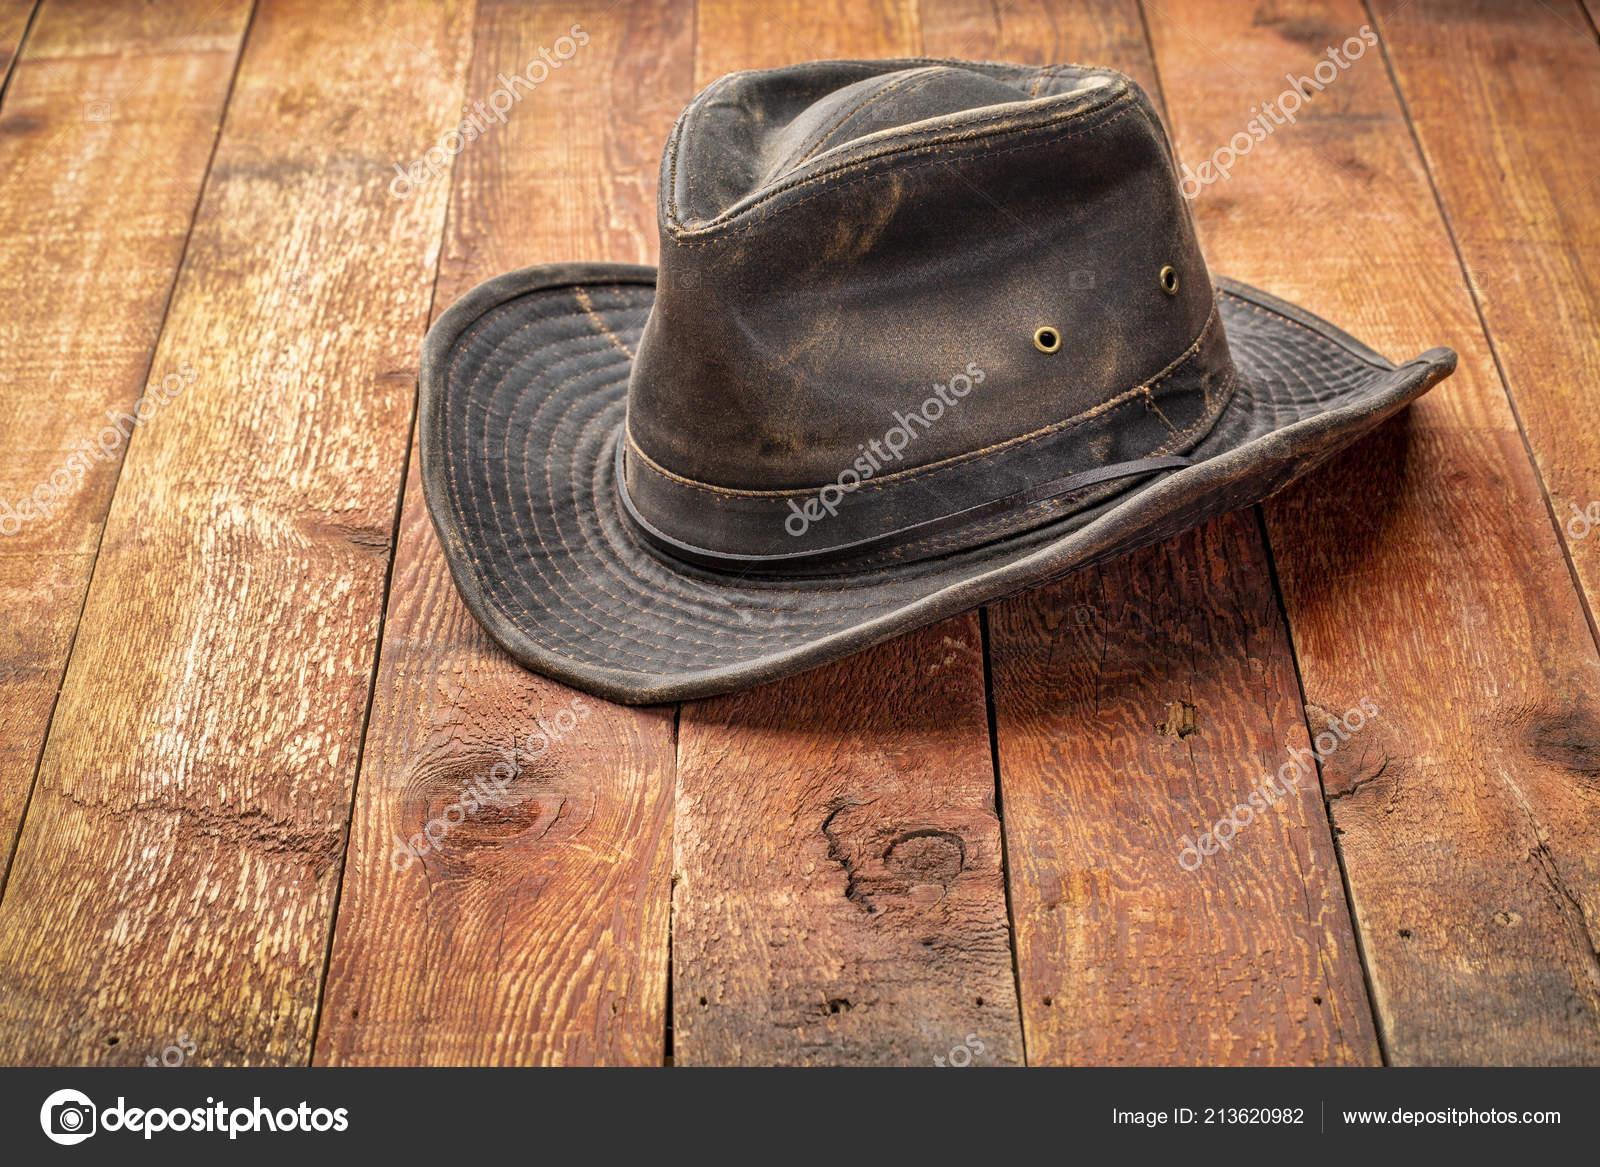 Máquina Sombrero Outback Madera Rústico Granero Rojo — Foto de stock ... 1cec475c1d4